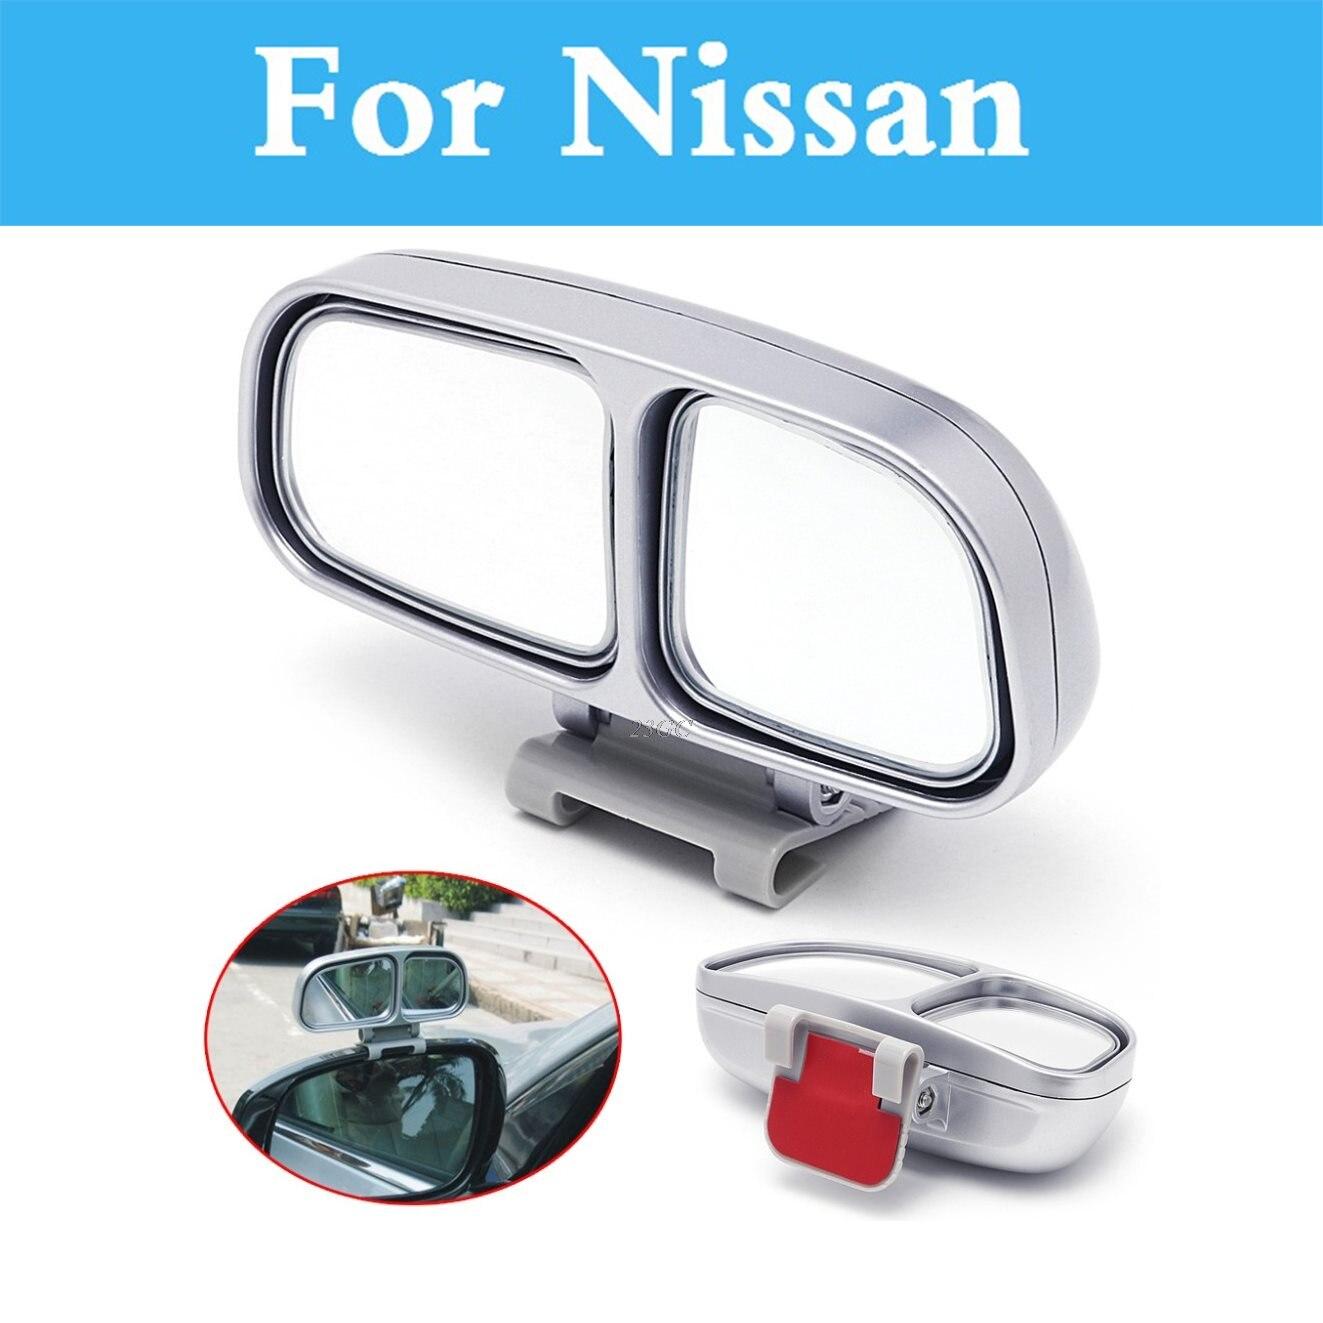 Adjustable convex wide angle blind spot mirror car for nissan altima armada avenir ad almera classic